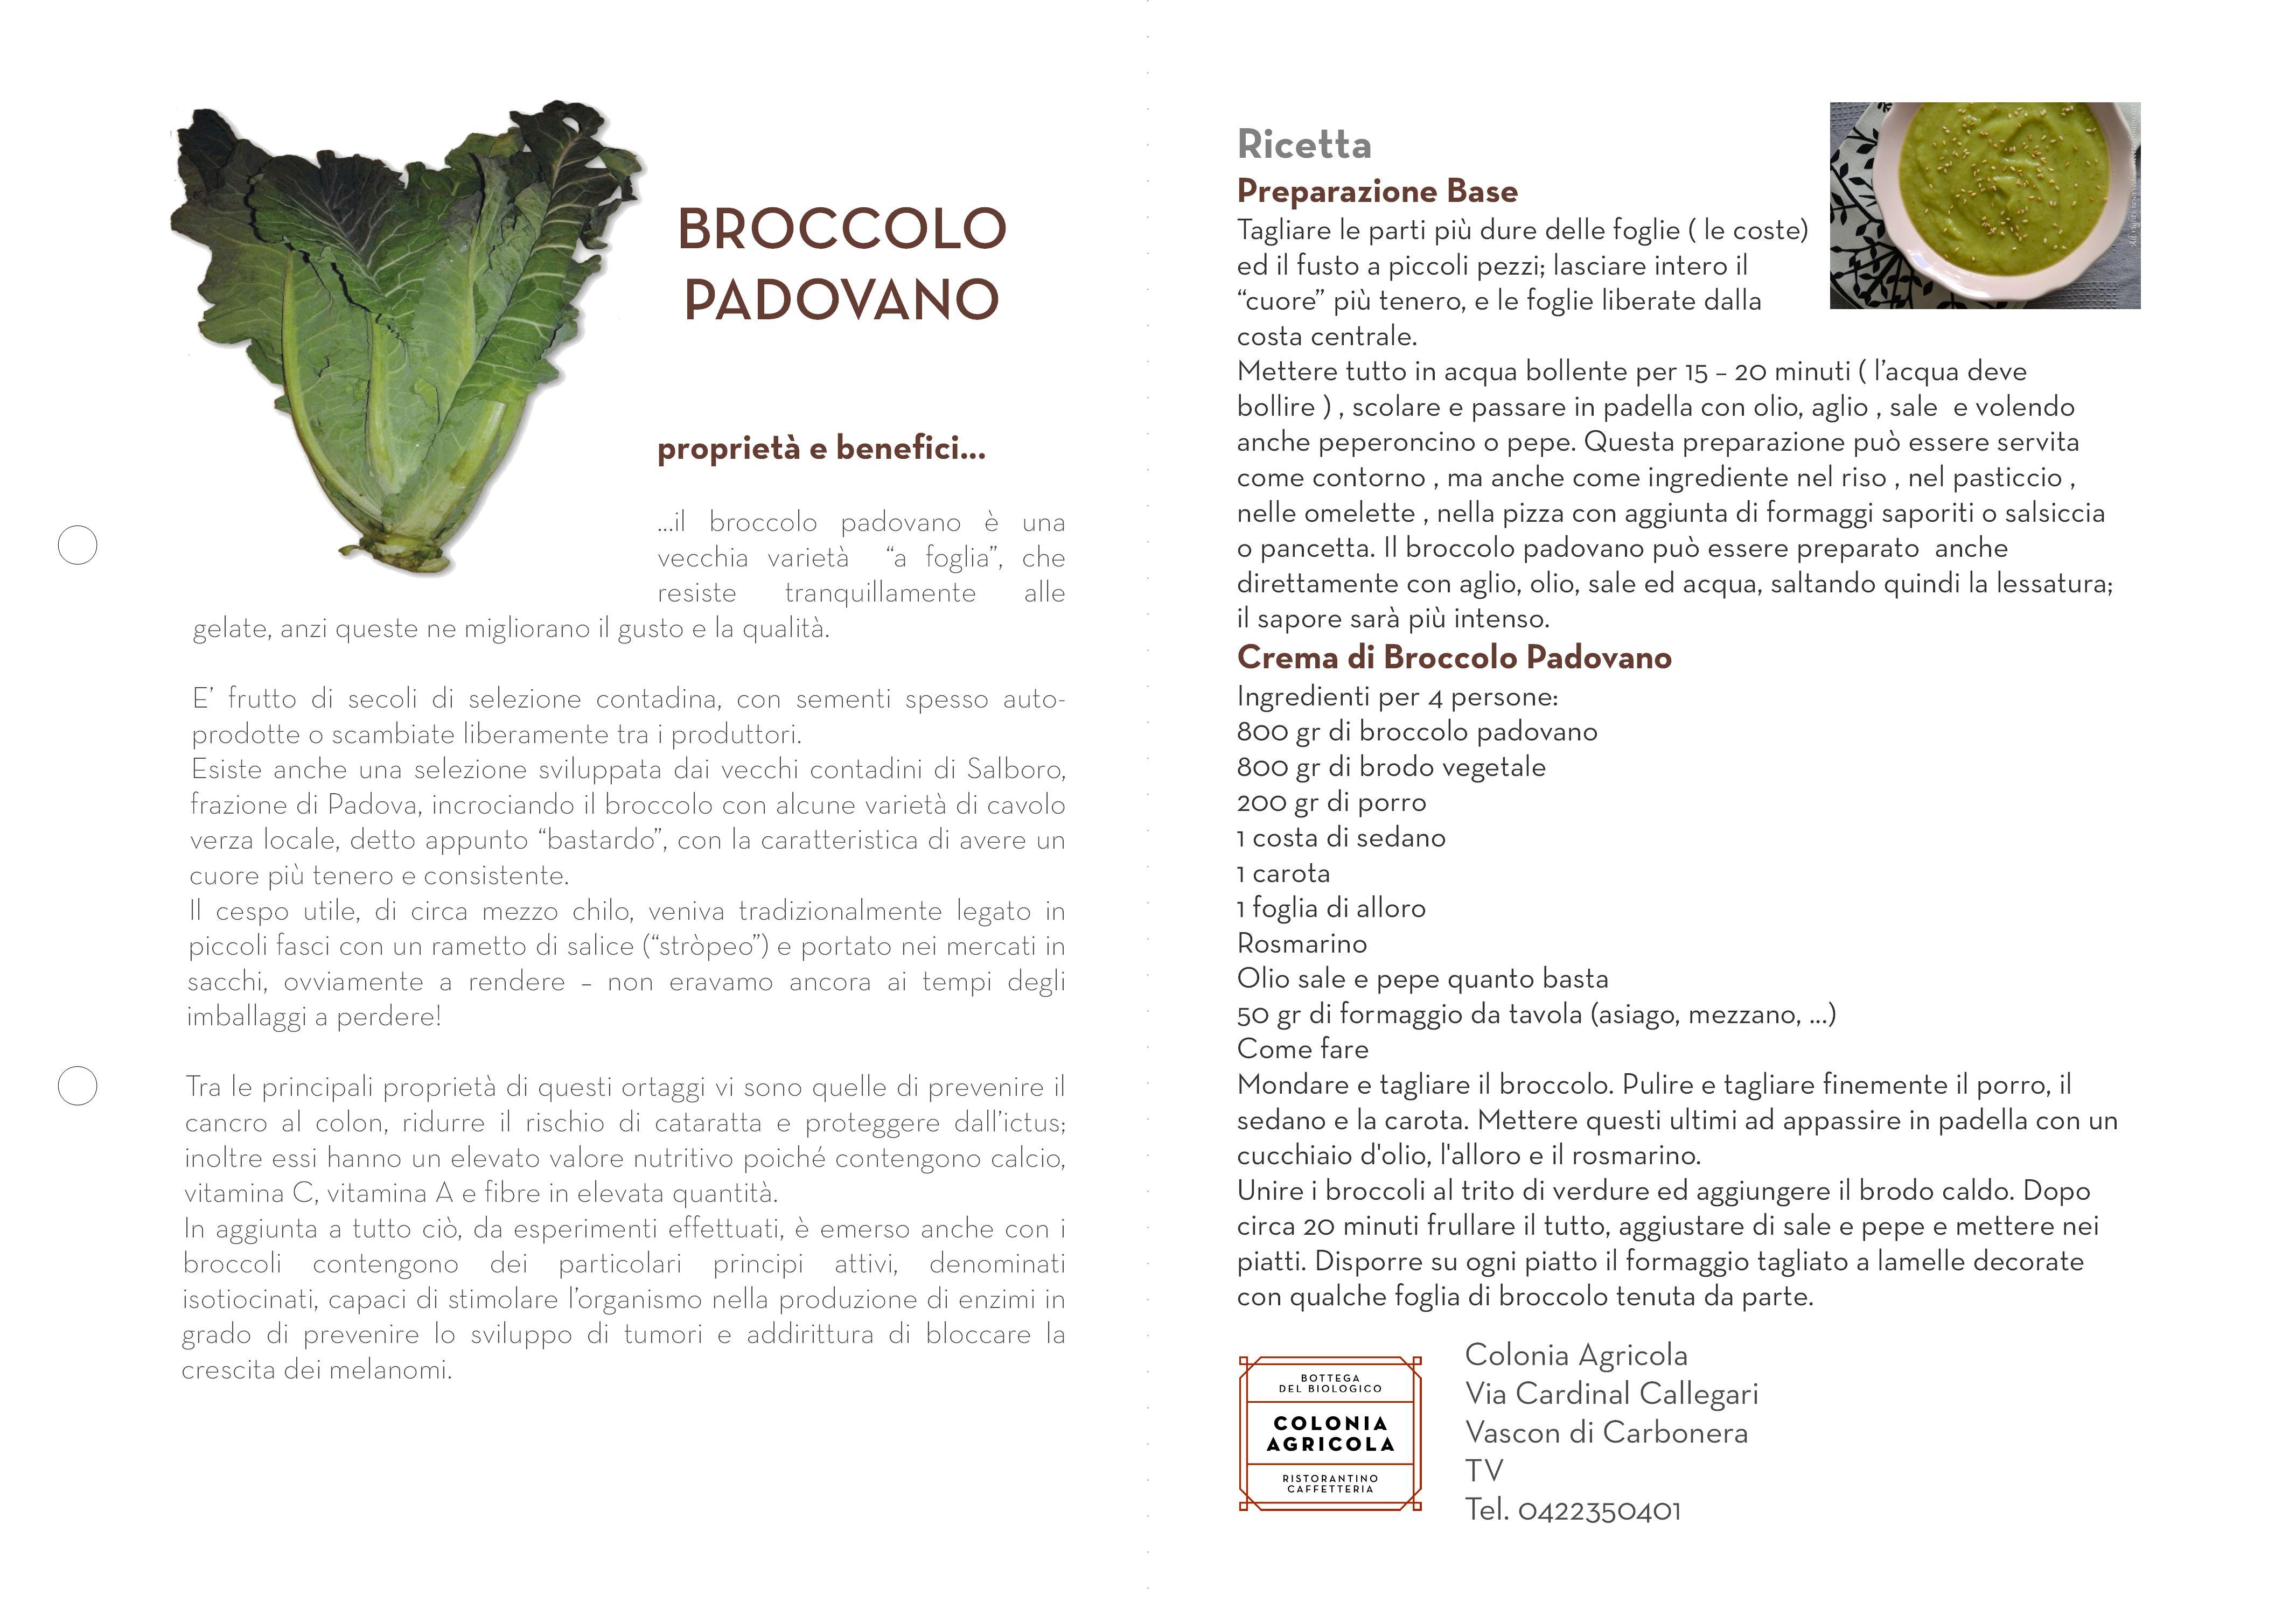 M0010_003_BroccoloPadovano001_XSOC